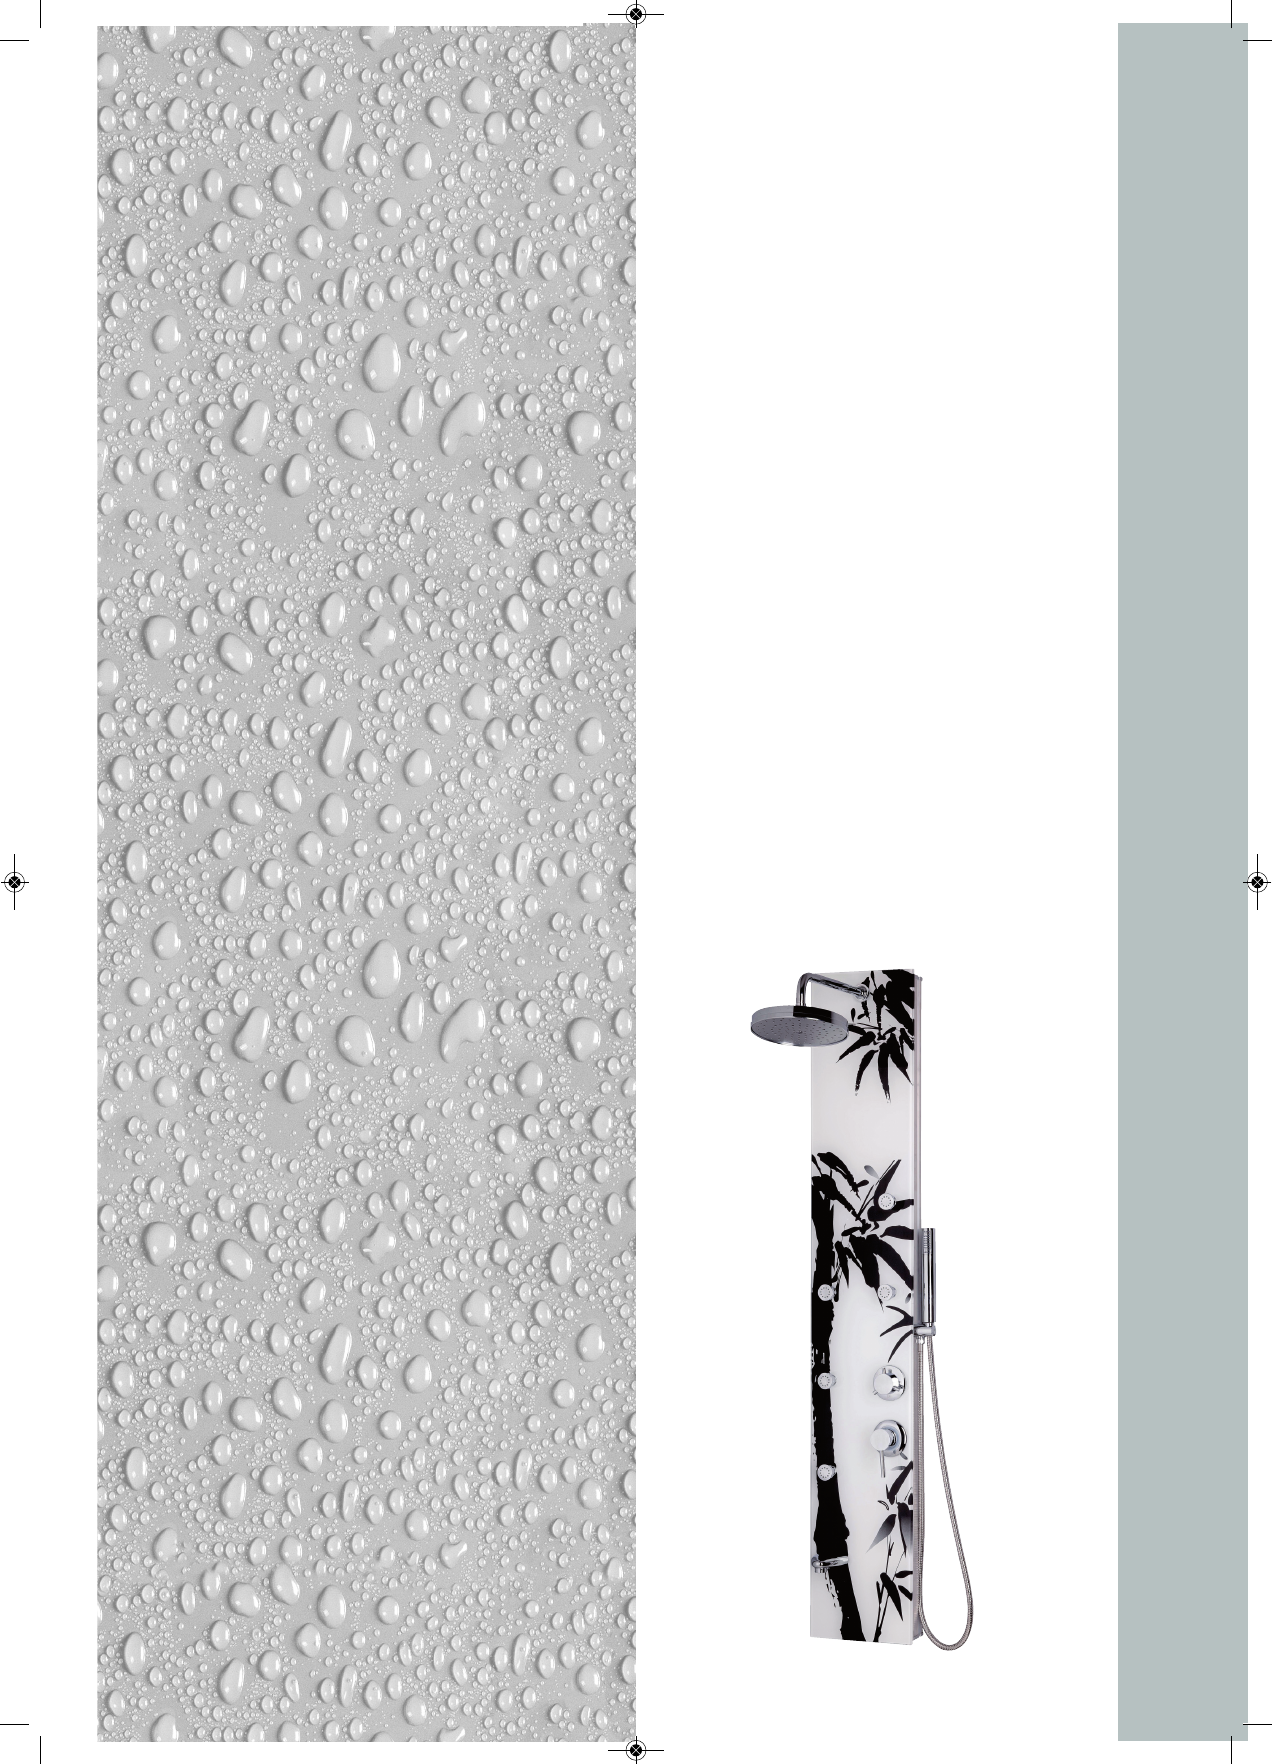 Full Size of Duschsäulen Eisl Sanitr Duschsulen Kopfbrausesets Dusche Duschsäulen